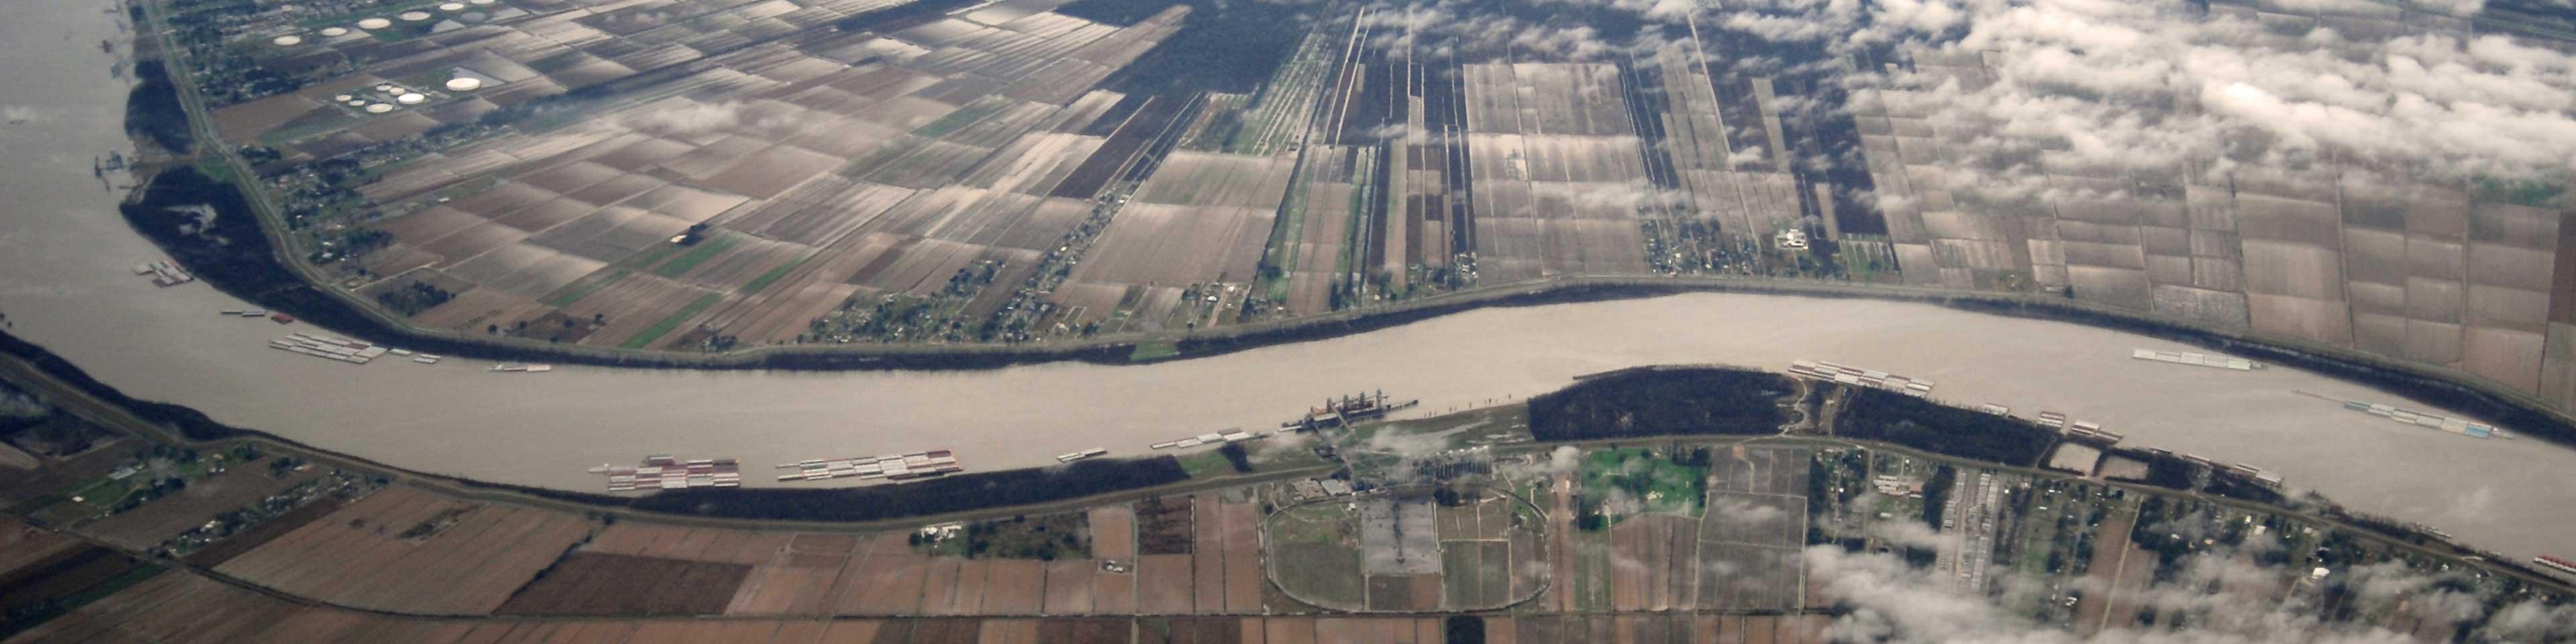 Flooding Land